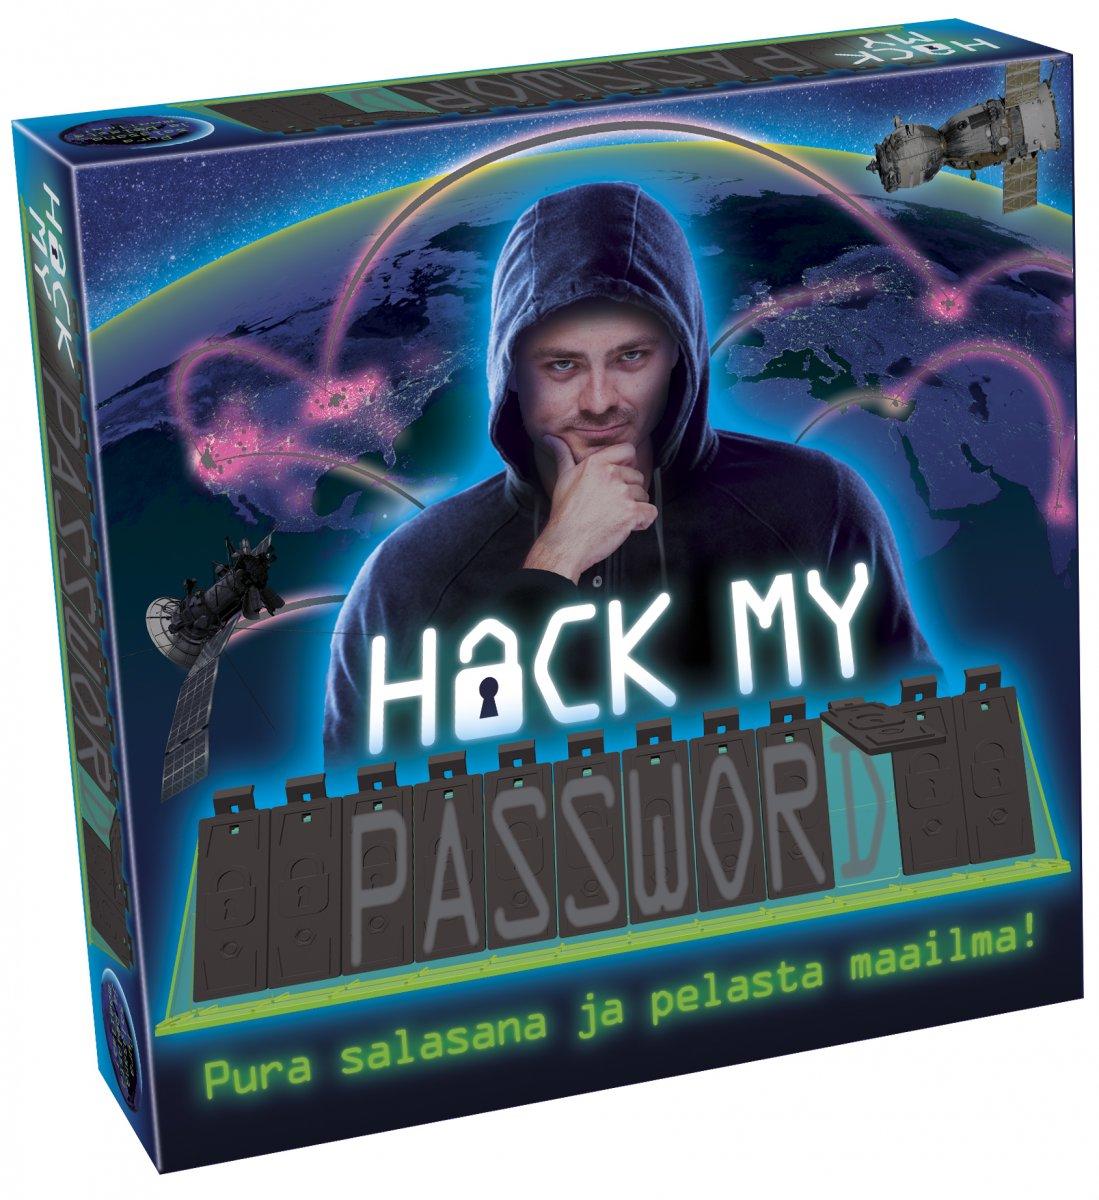 Hack my password